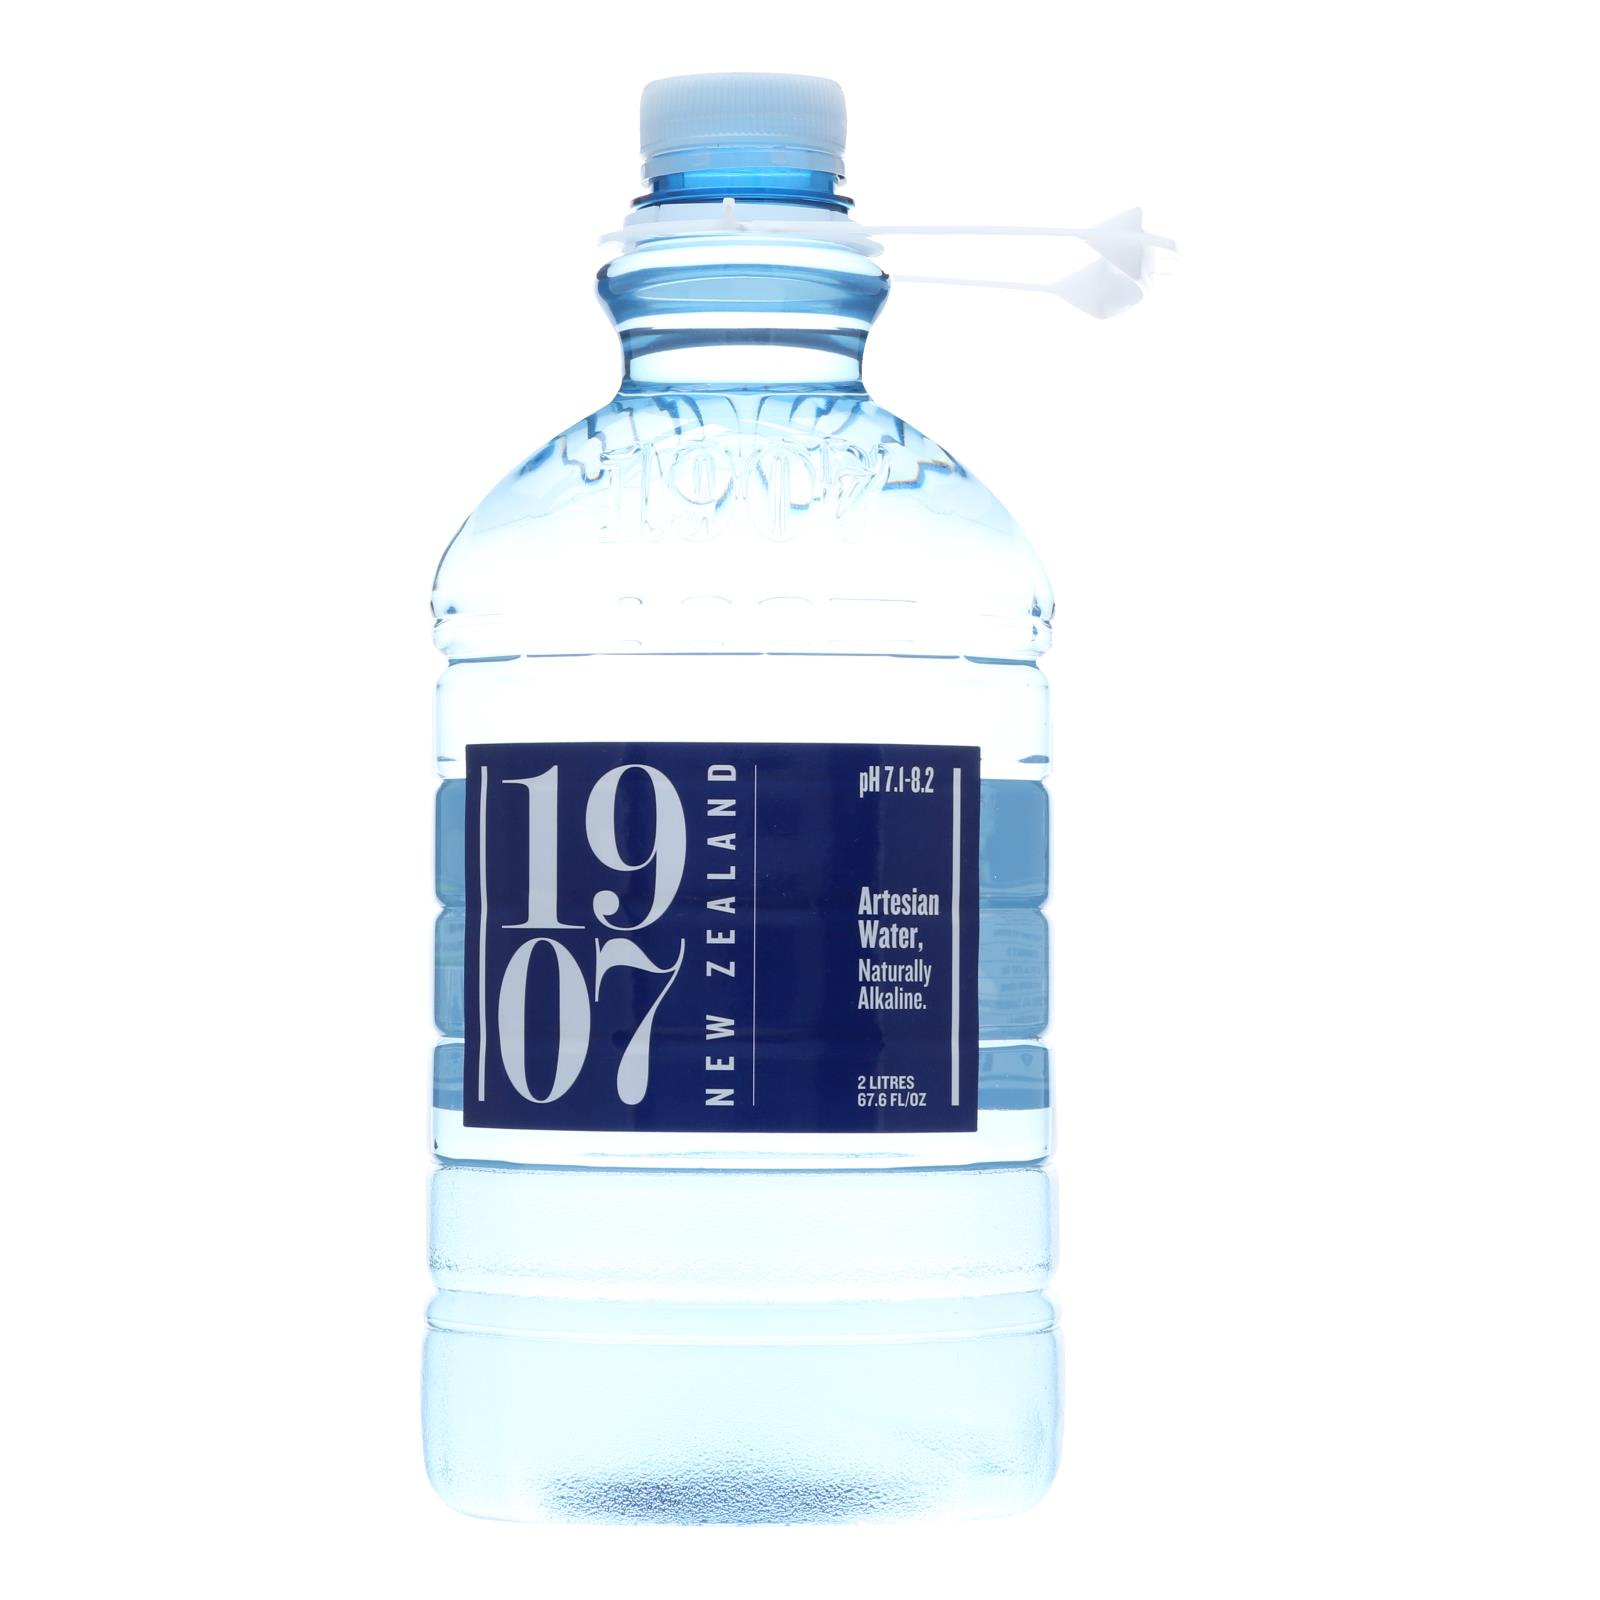 1907 - New Zealand Artesian Water - Case of 8 - 67.6 fl oz.